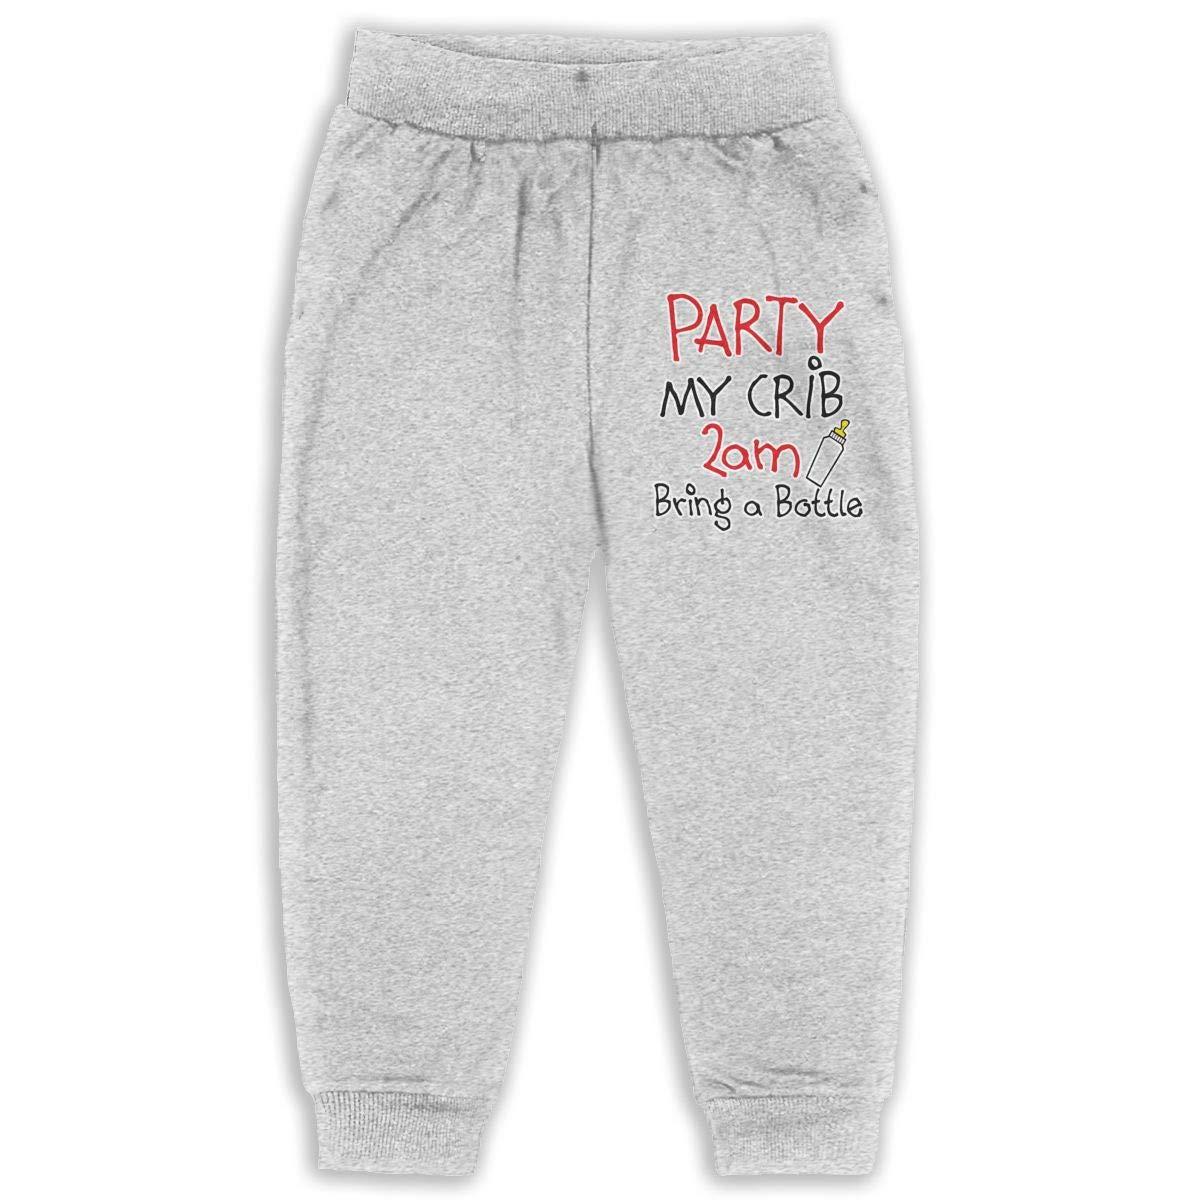 Laoyaotequ Cosy Party at My Crib 2 A.m Bring Bottle Kids Cotton Sweatpants,Jogger Long Jersey Sweatpants